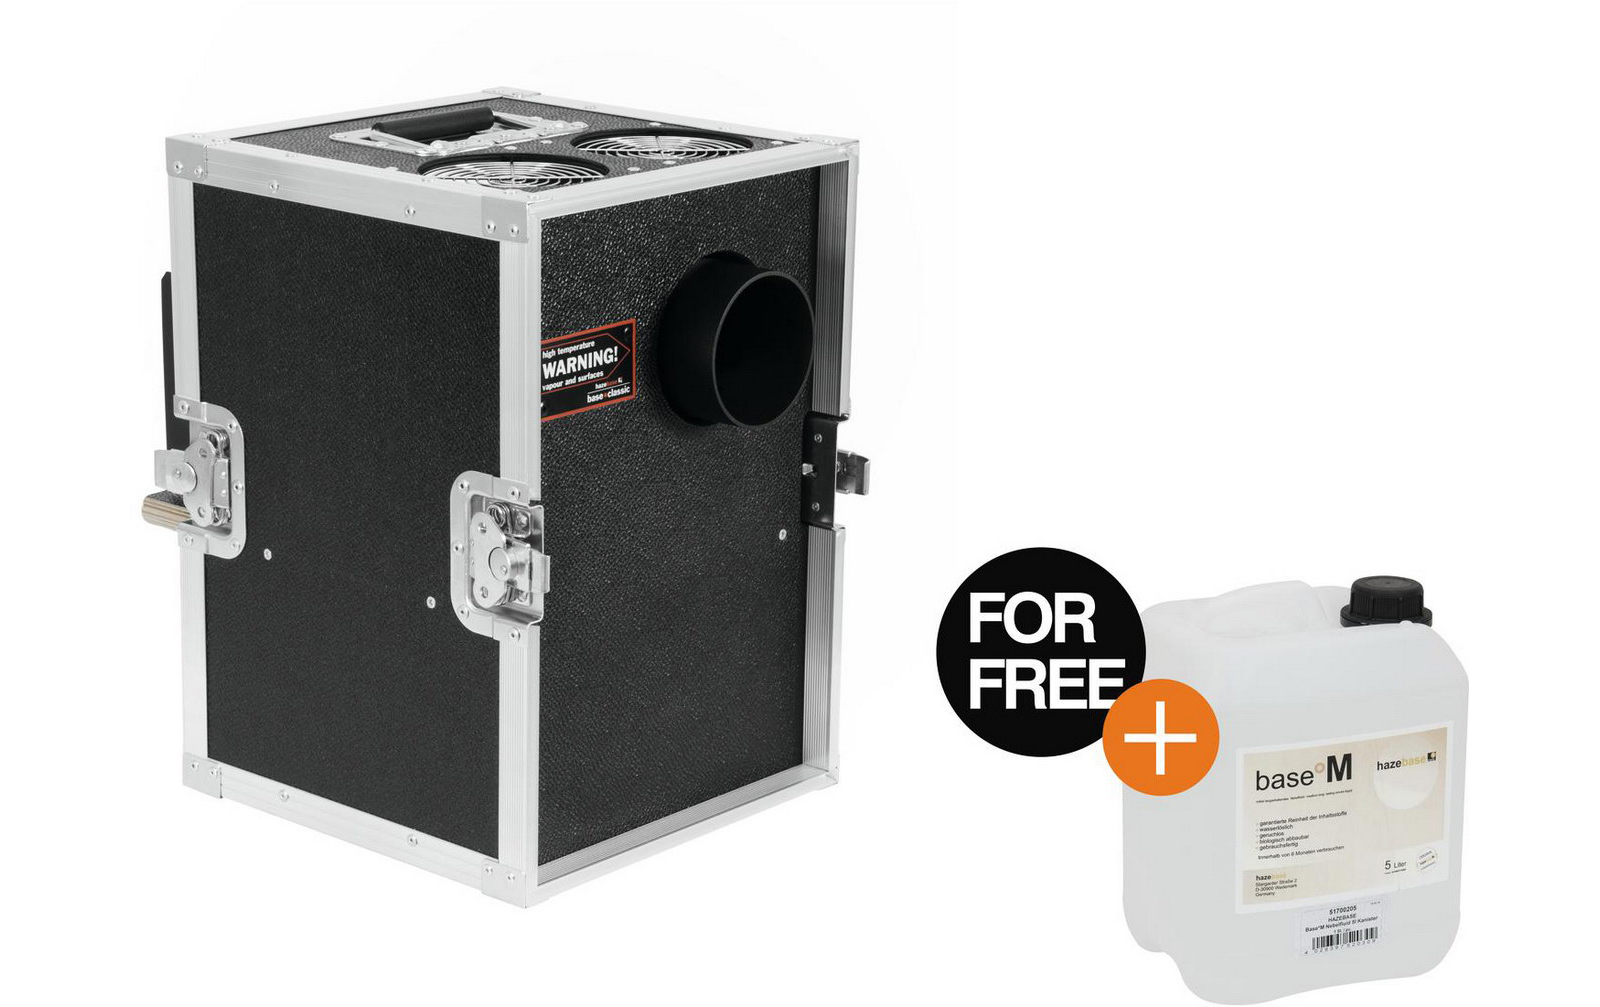 hazebase-set-classic-cased-nebelmaschine-m-fluid-5l